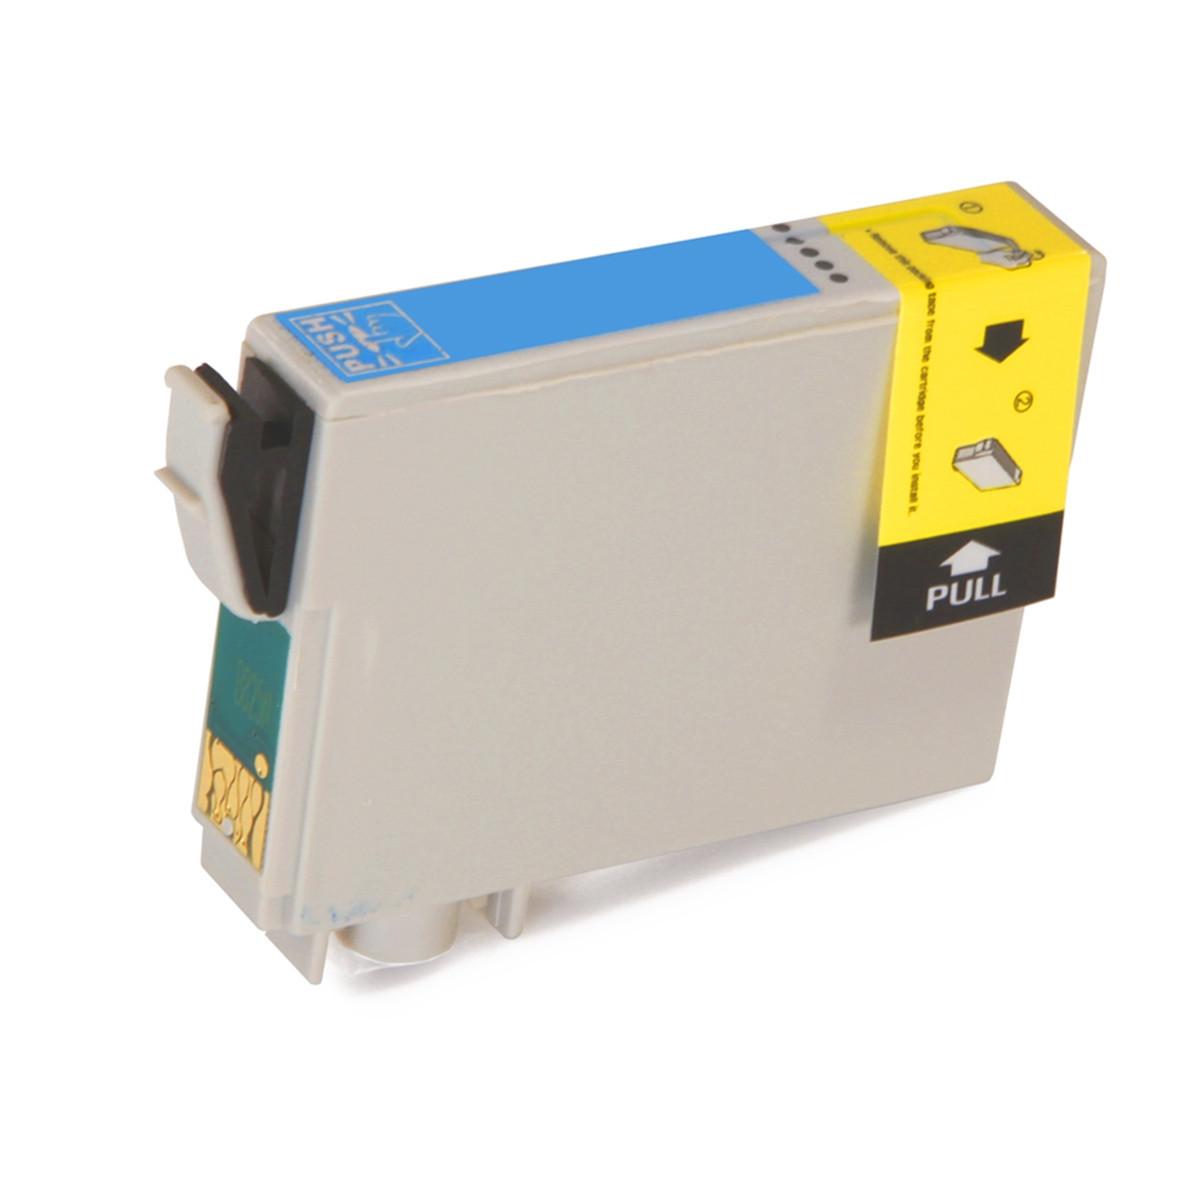 Cartucho de Tinta Compatível com Epson T048520 T048 T0485 Ciano Claro R200 R320 RX500 RX600 | 12ml